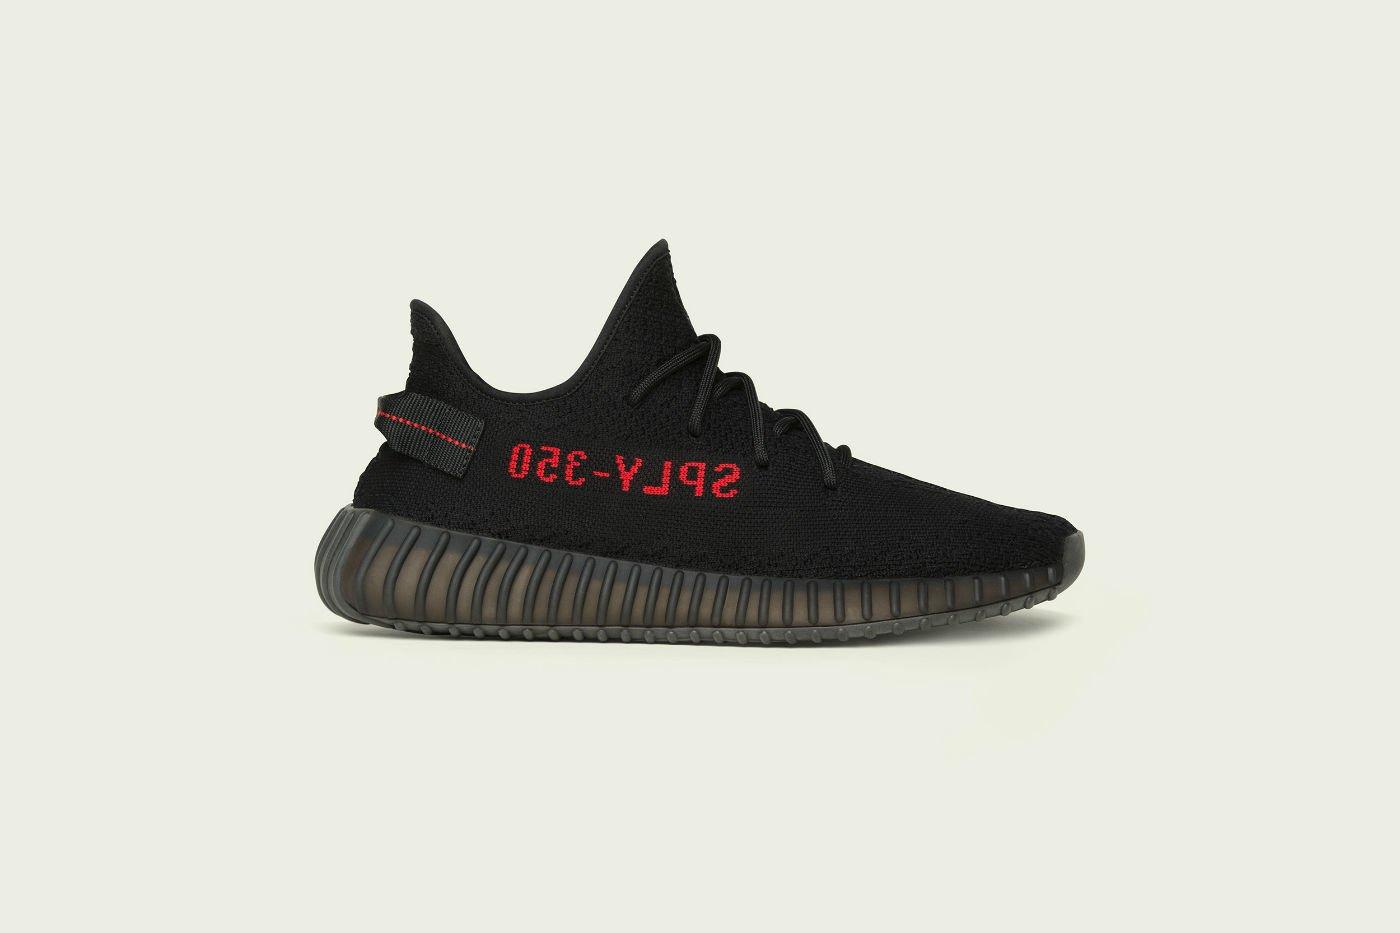 adidas Originals Yeezy Boost V2 Black/Red